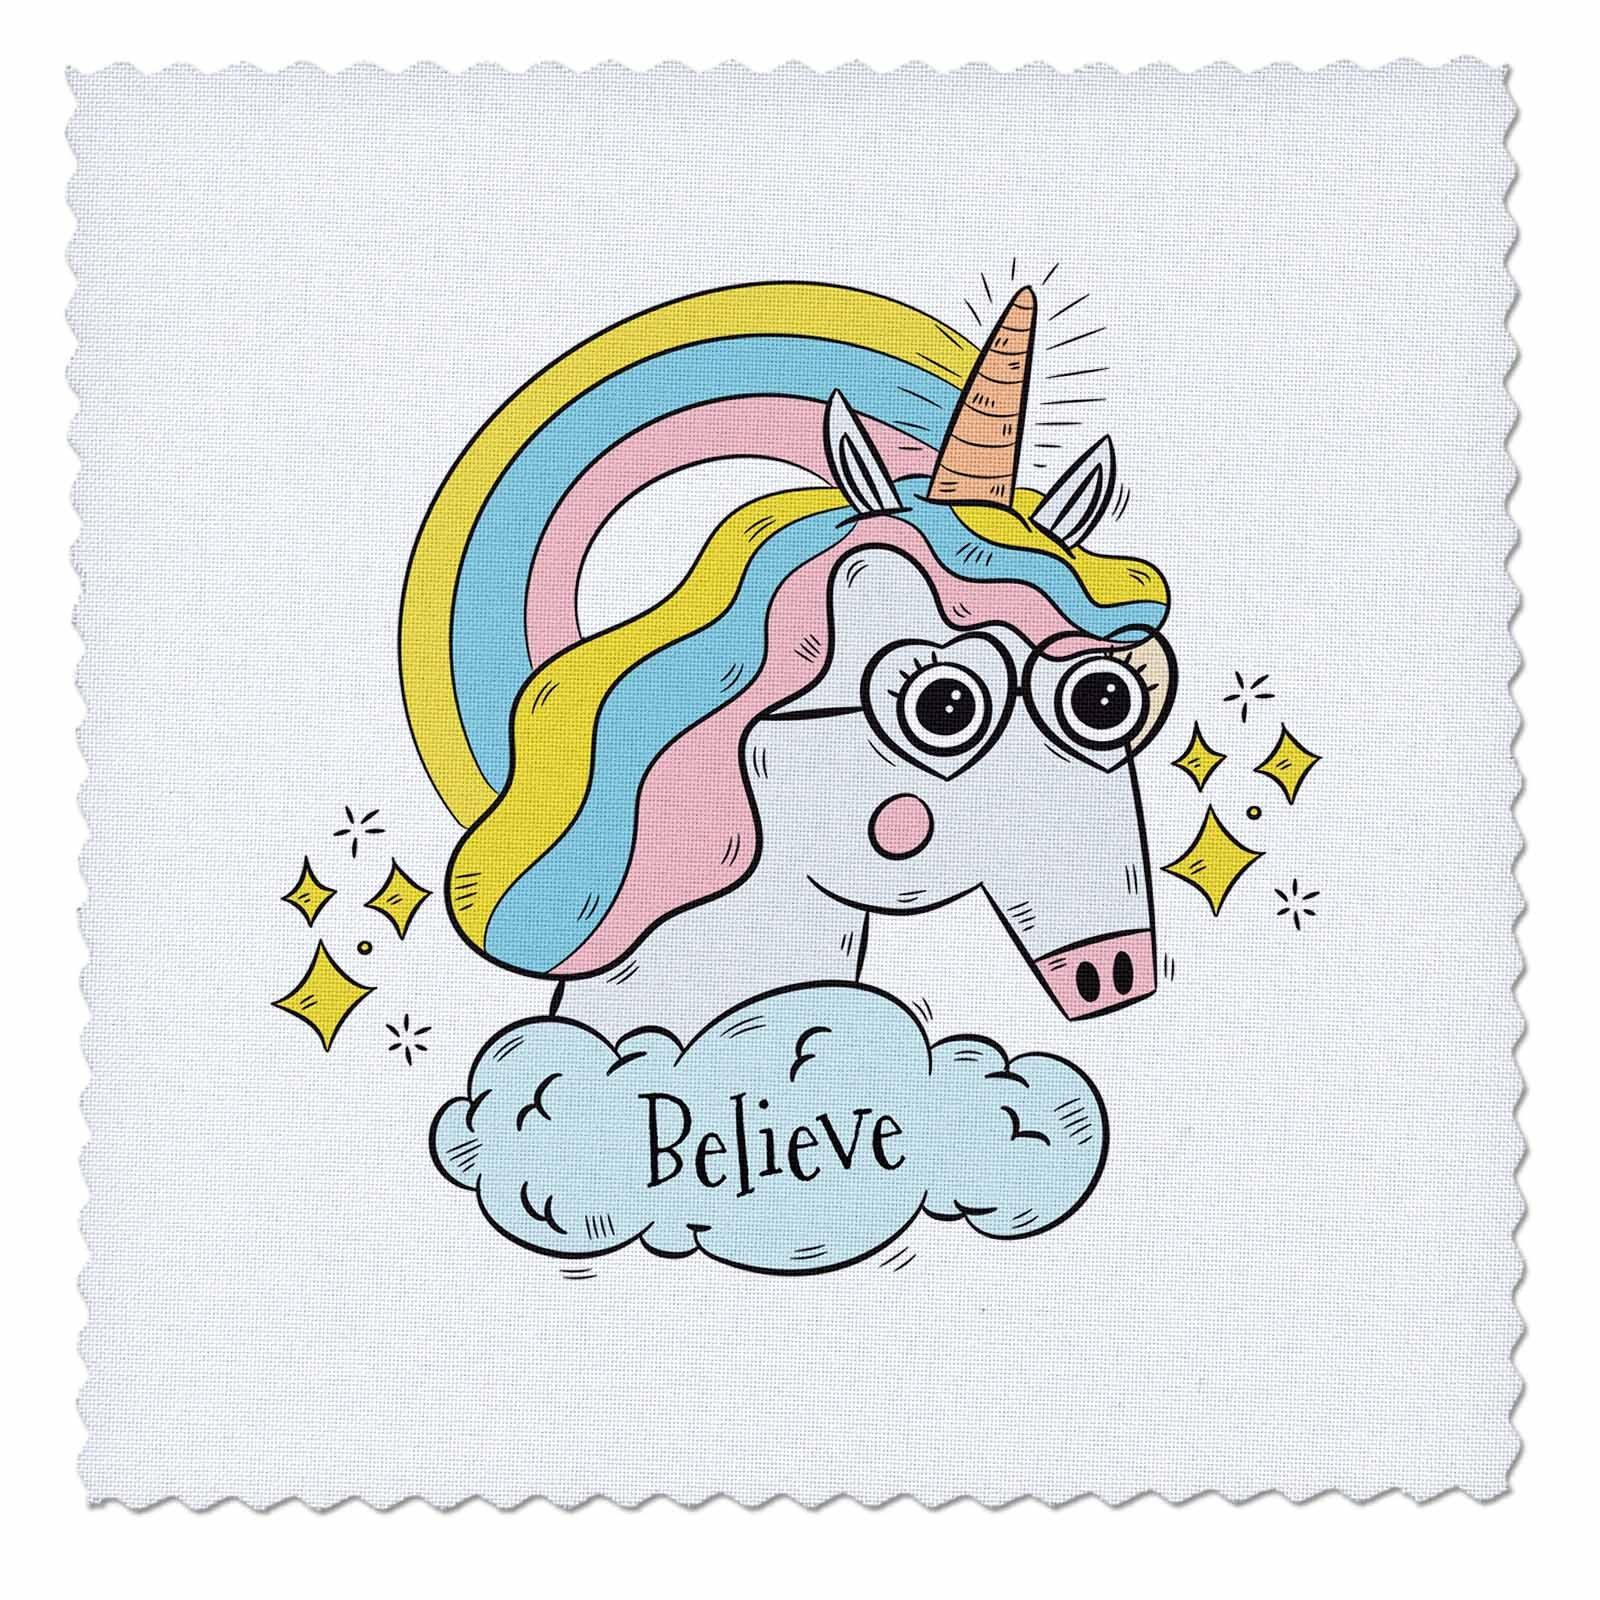 3dRose Sven Herkenrath Animal - Funny Fantasy Unicorn with Sunglasses Believe - 18x18 inch quilt square (qs_280356_7)